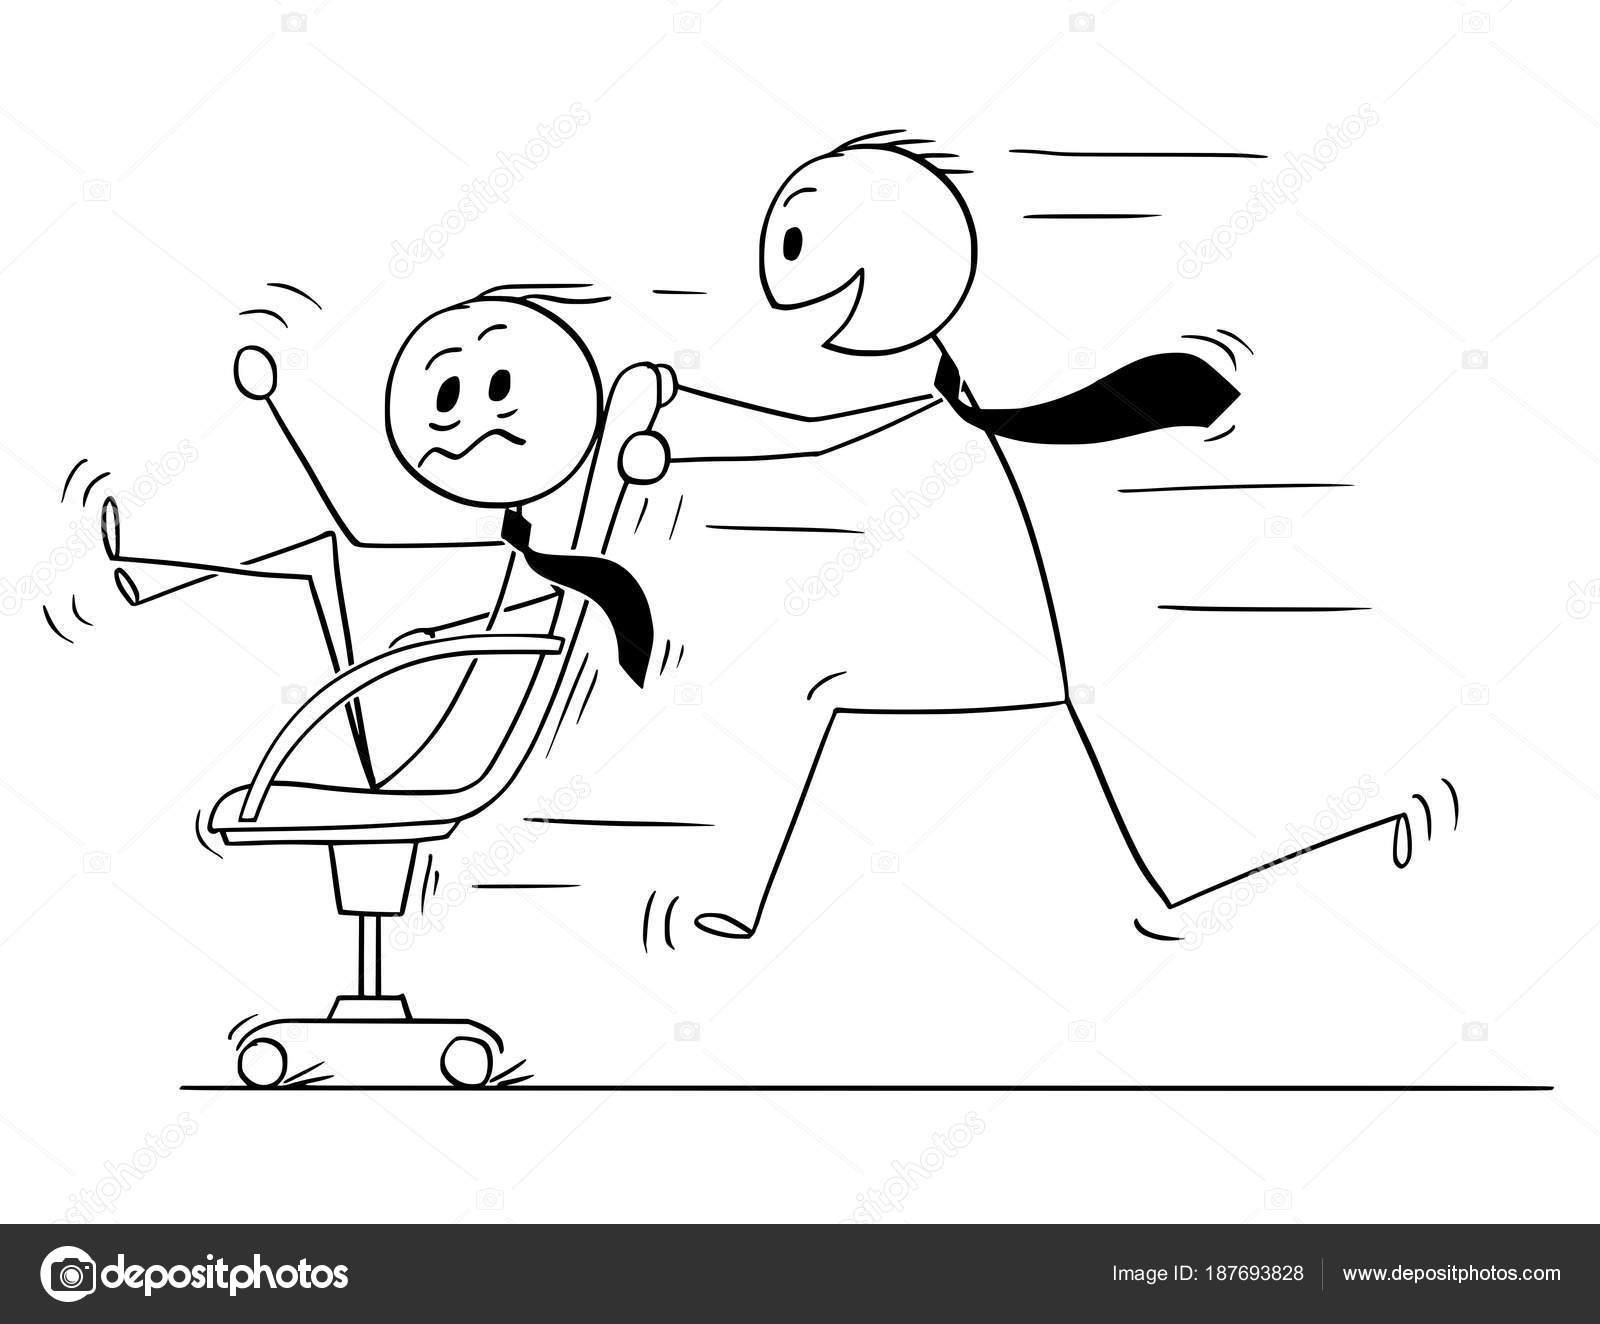 Bürostuhl comic  Cartoon of Businessman Riding on Chair Enjoying Fun in Office ...